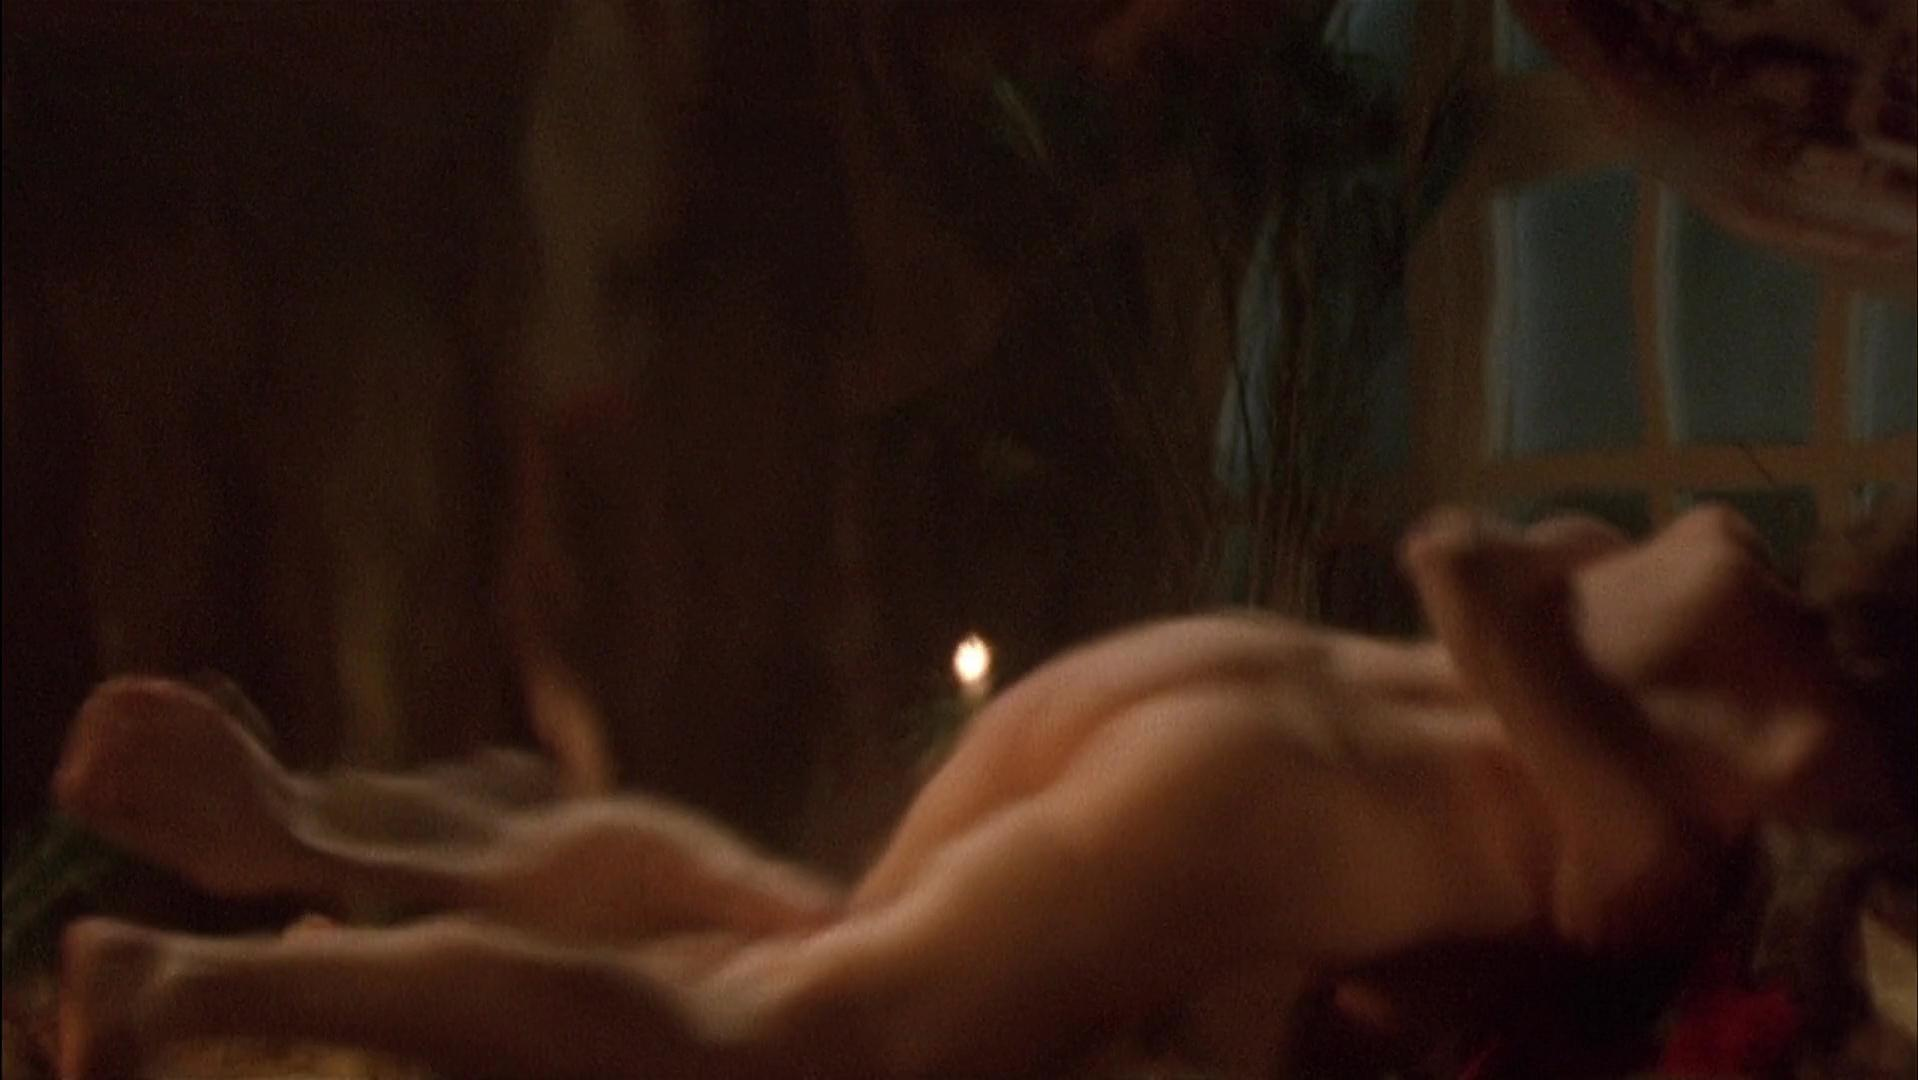 Toni Collette nude - Velvet Goldmine (1998)